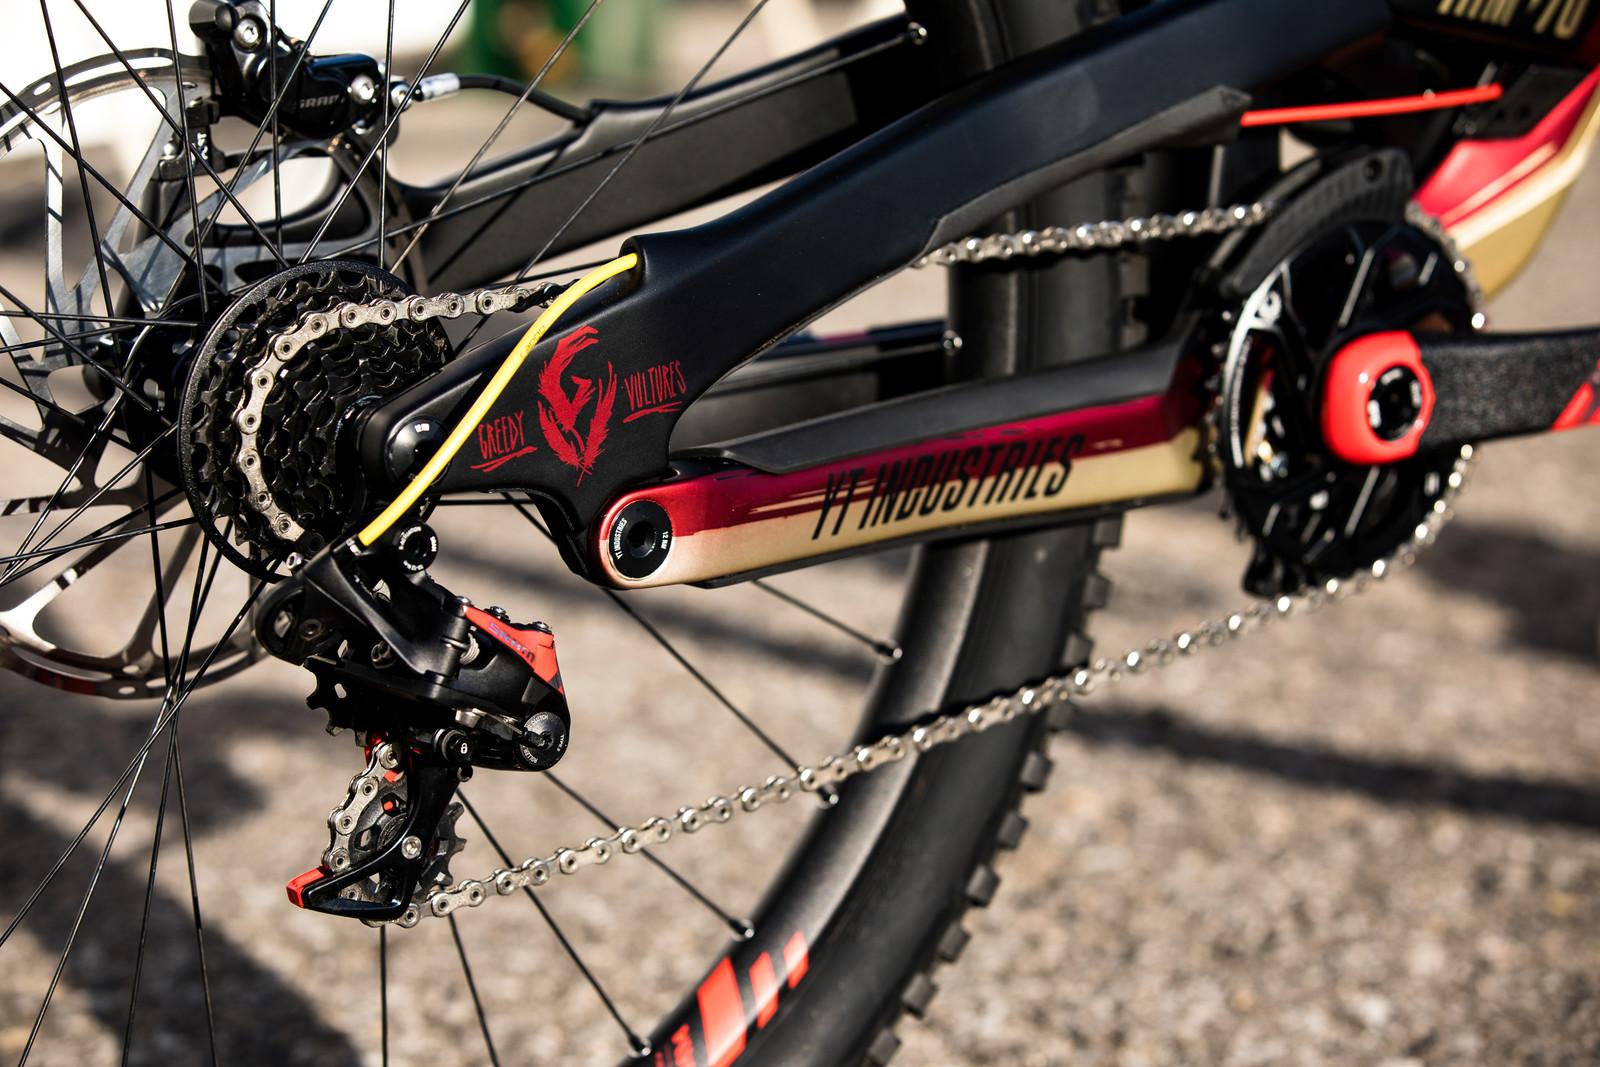 MSA19 BB020060 - Erik Irmisch's YT TUES at 2019 Worlds MSA - Mountain Biking Pictures - Vital MTB